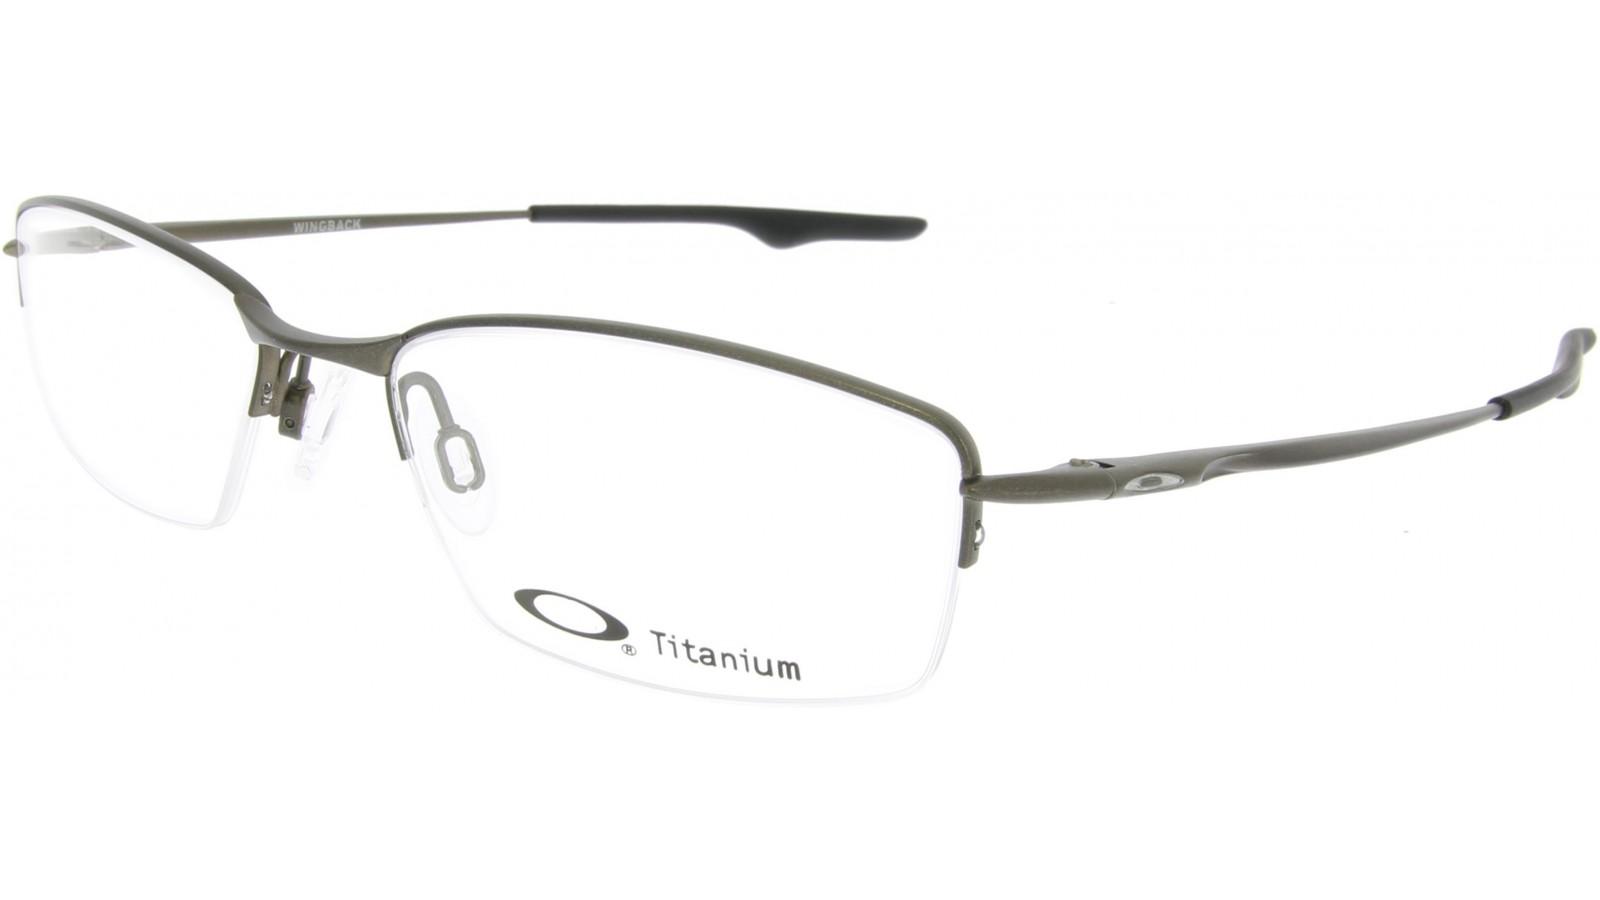 Oakley Brille für Herren OX 5089-05 Wingback IuurbJ